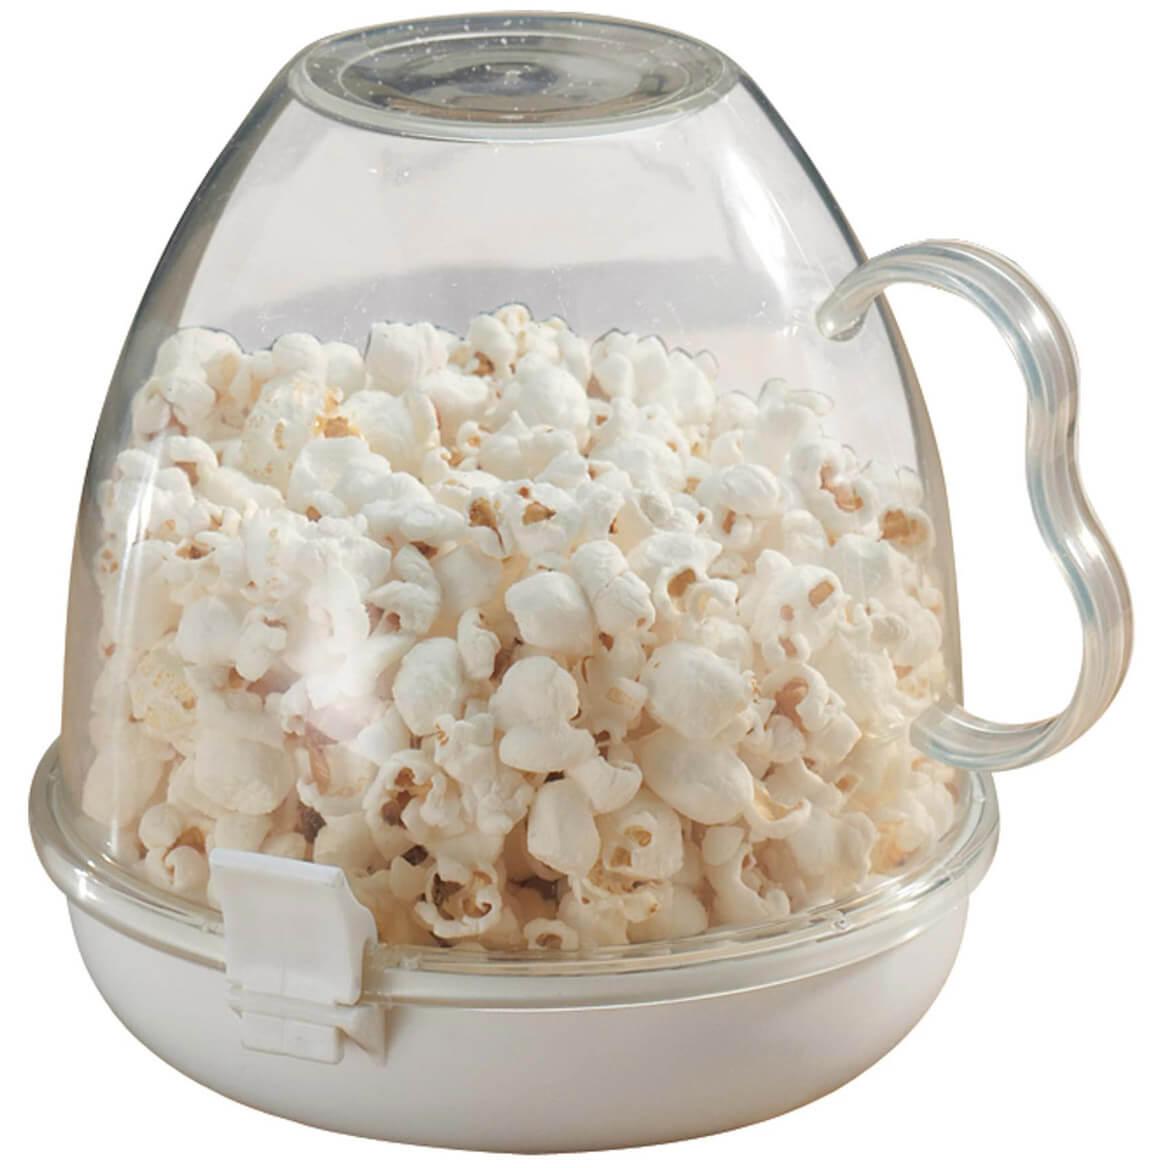 Handled Microwave Popcorn Maker